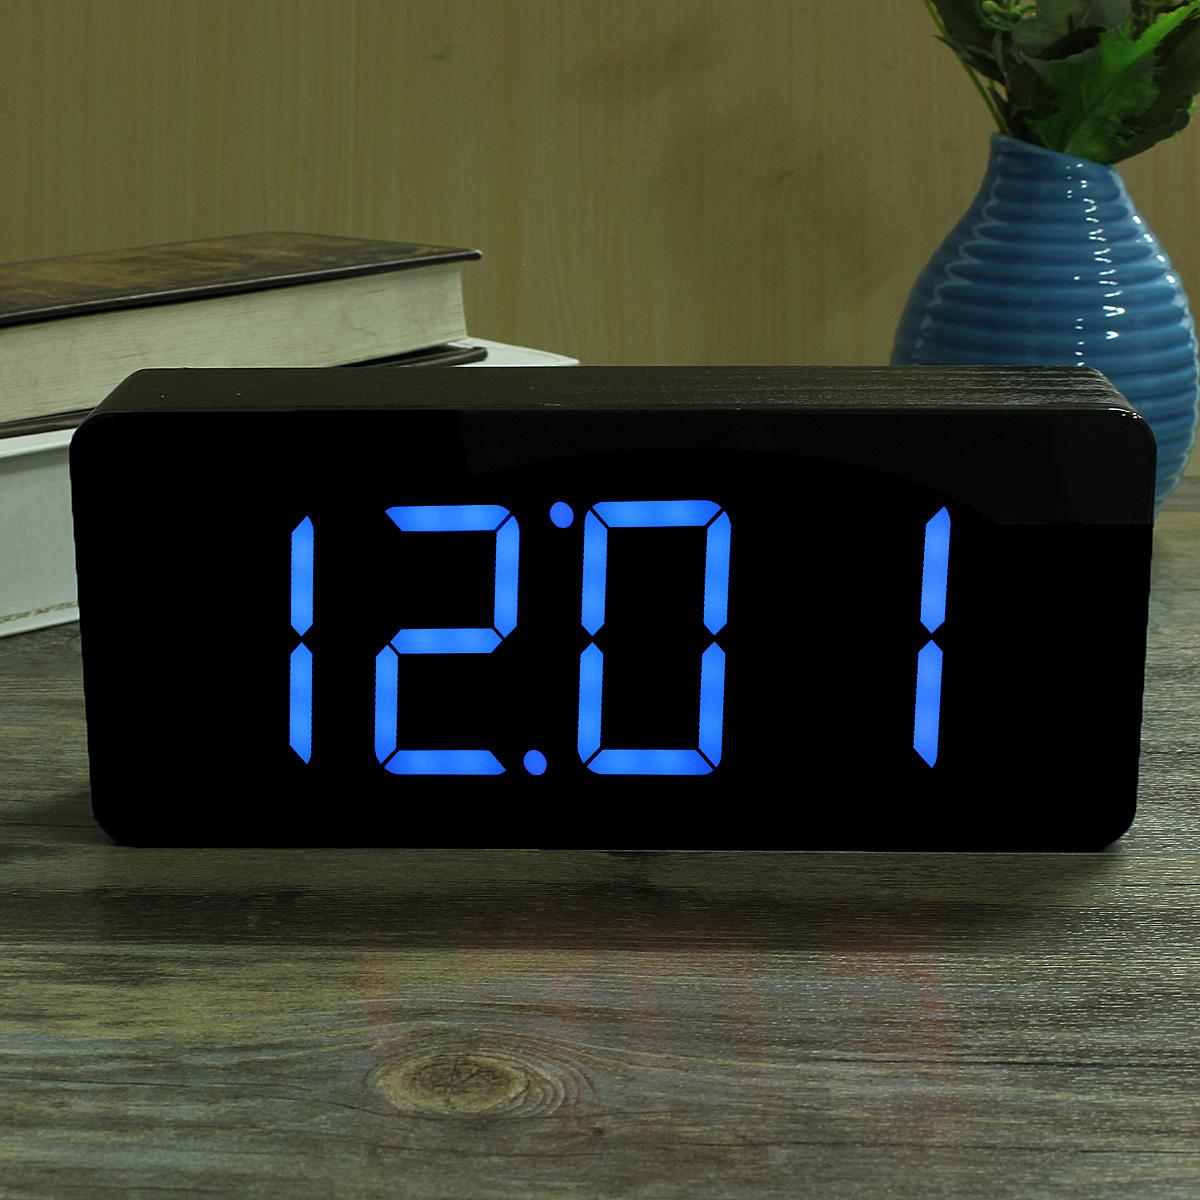 Acrylique Miroir Alarme Reveil Horloge LED Bois Numerique Temperature